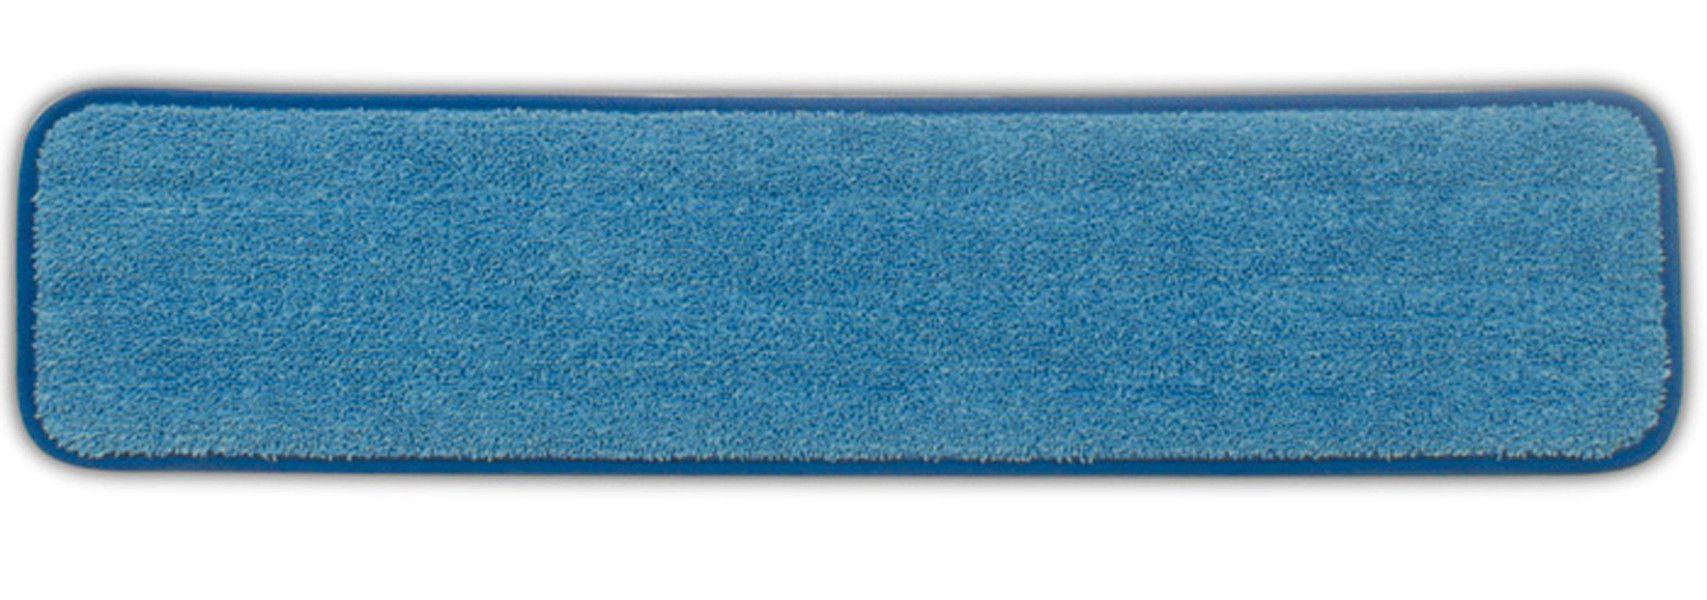 Mop Úmido Microfibra 62.2cm Azul - FGQ41100BL00 - Rubbermaid